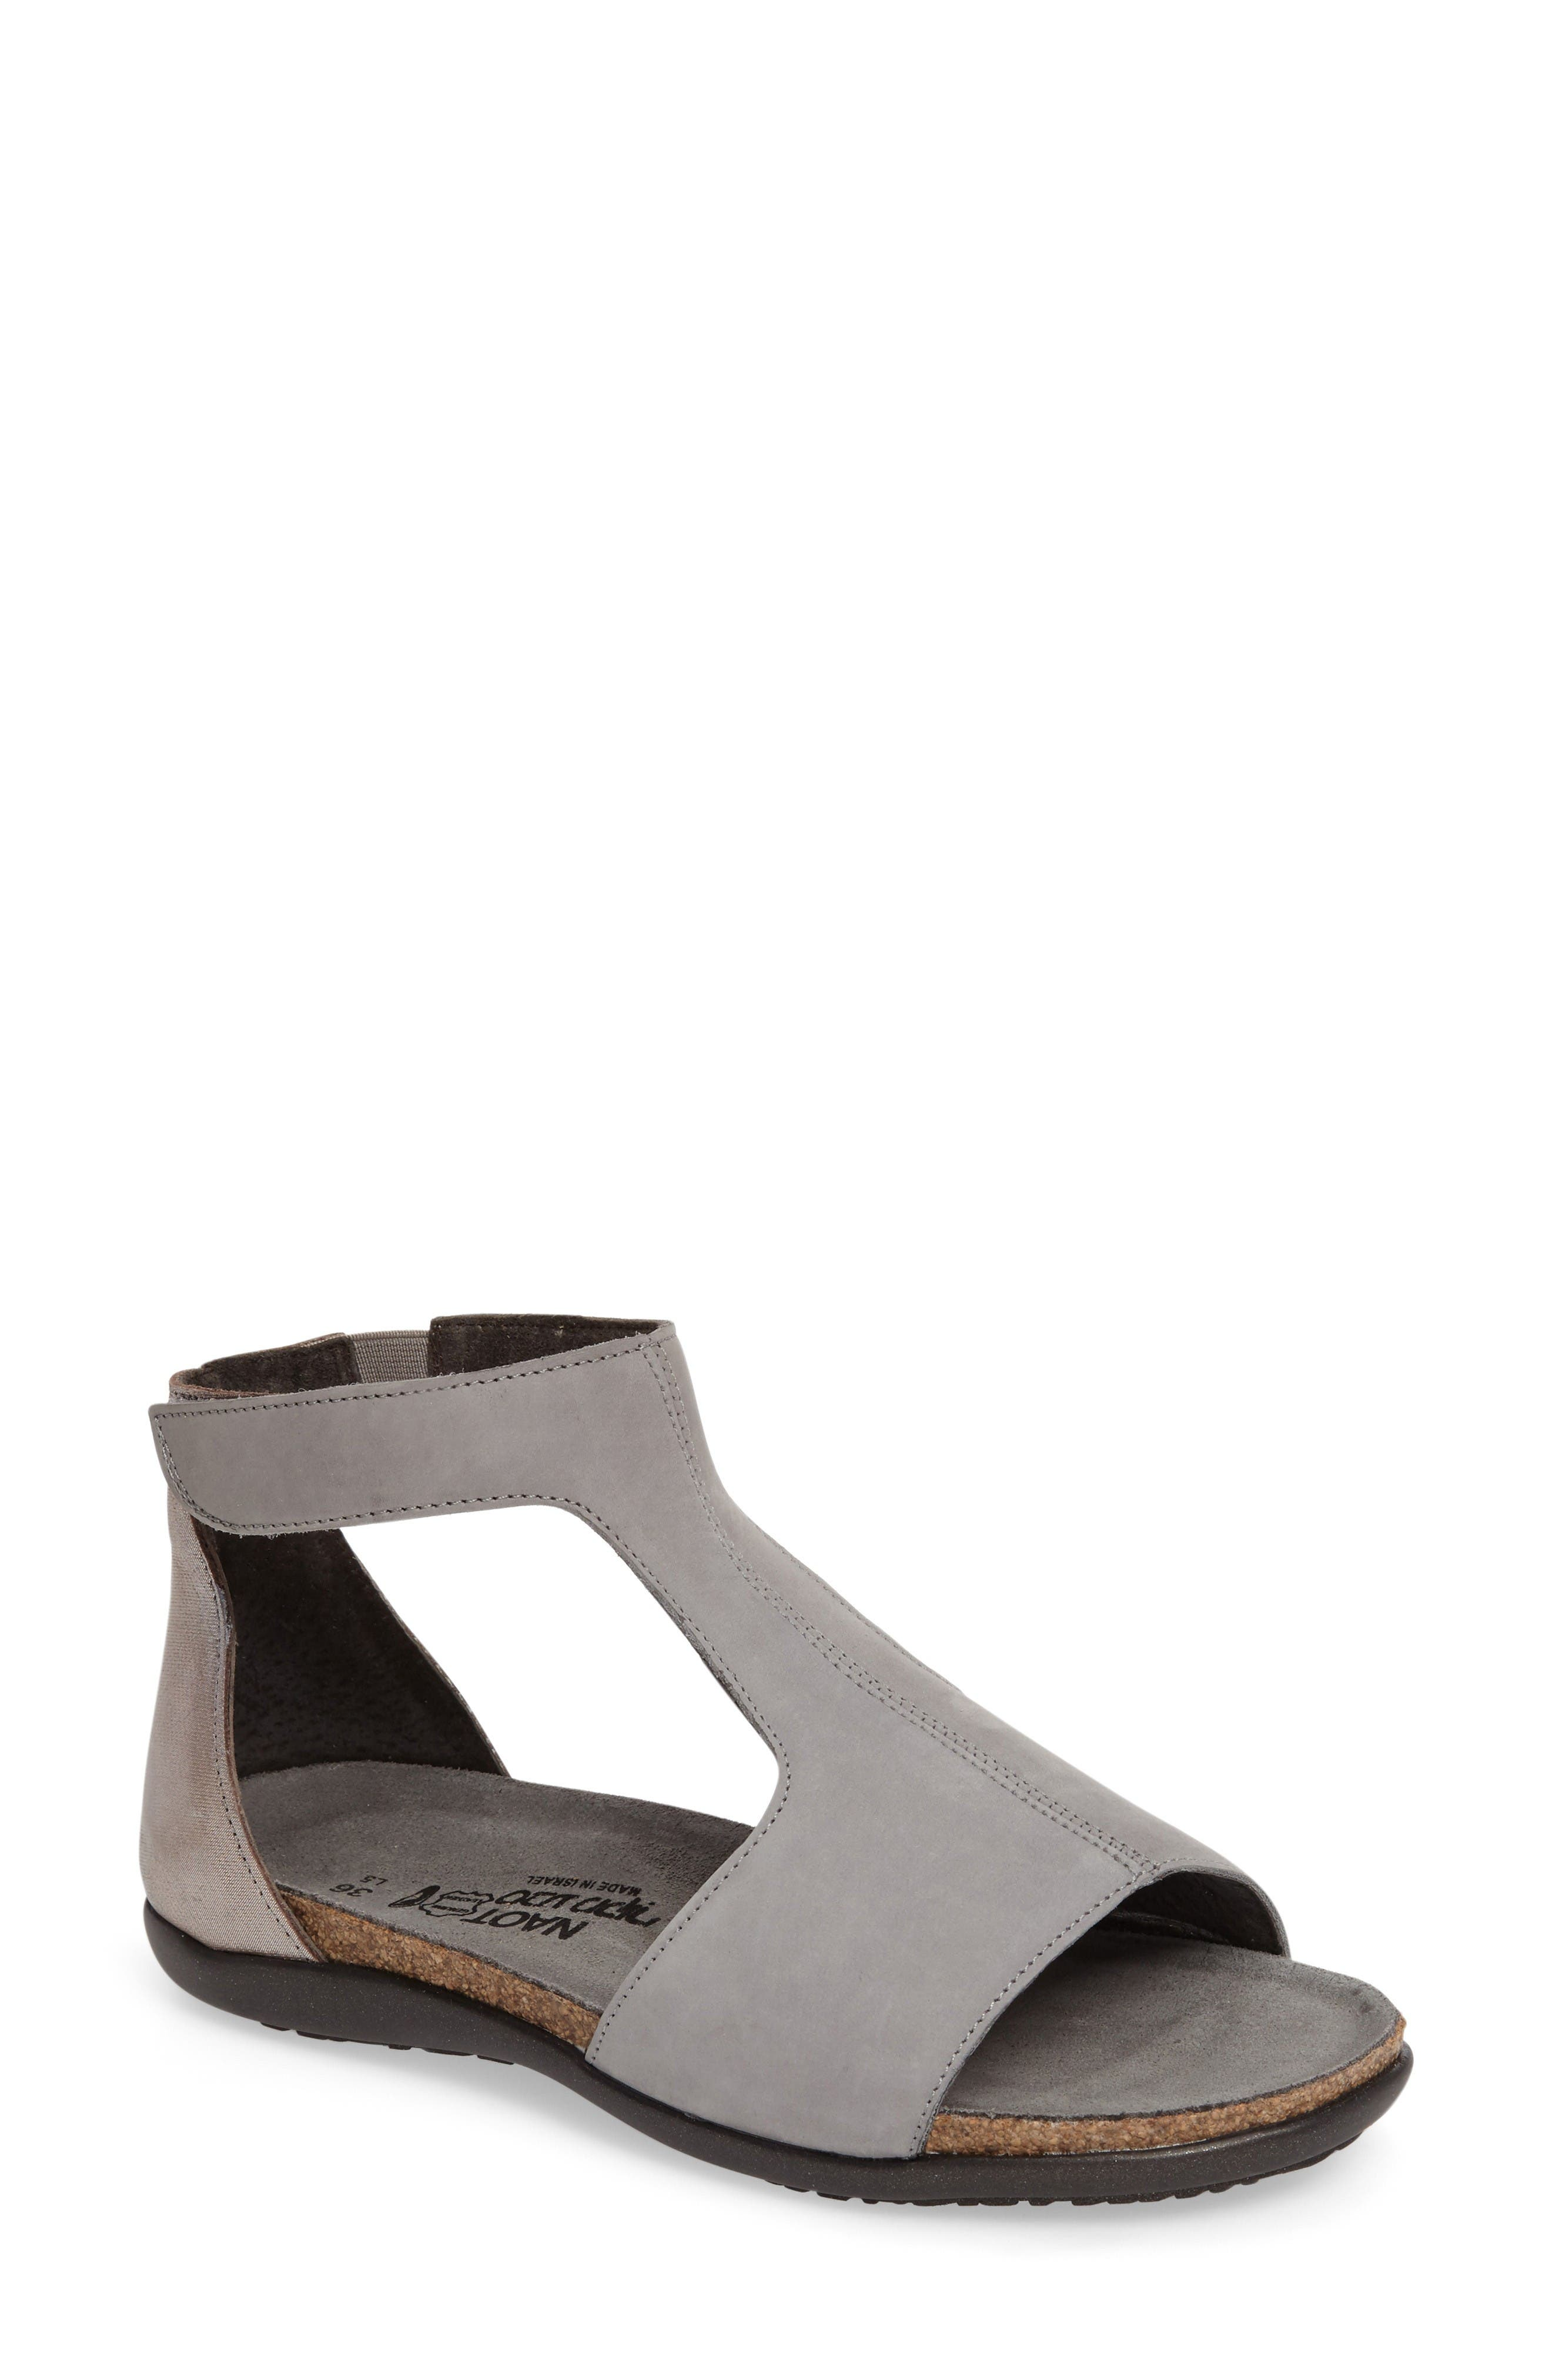 Nala Sandal,                         Main,                         color, Grey/ Silver Nubuck Leather